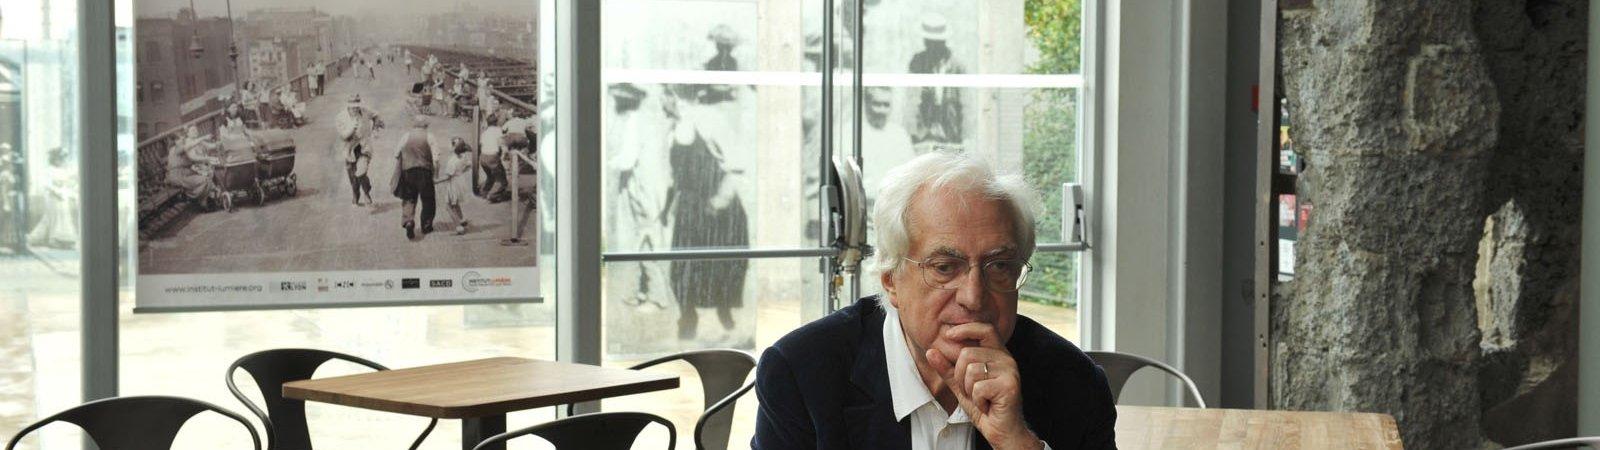 Photo dernier film André Marcon